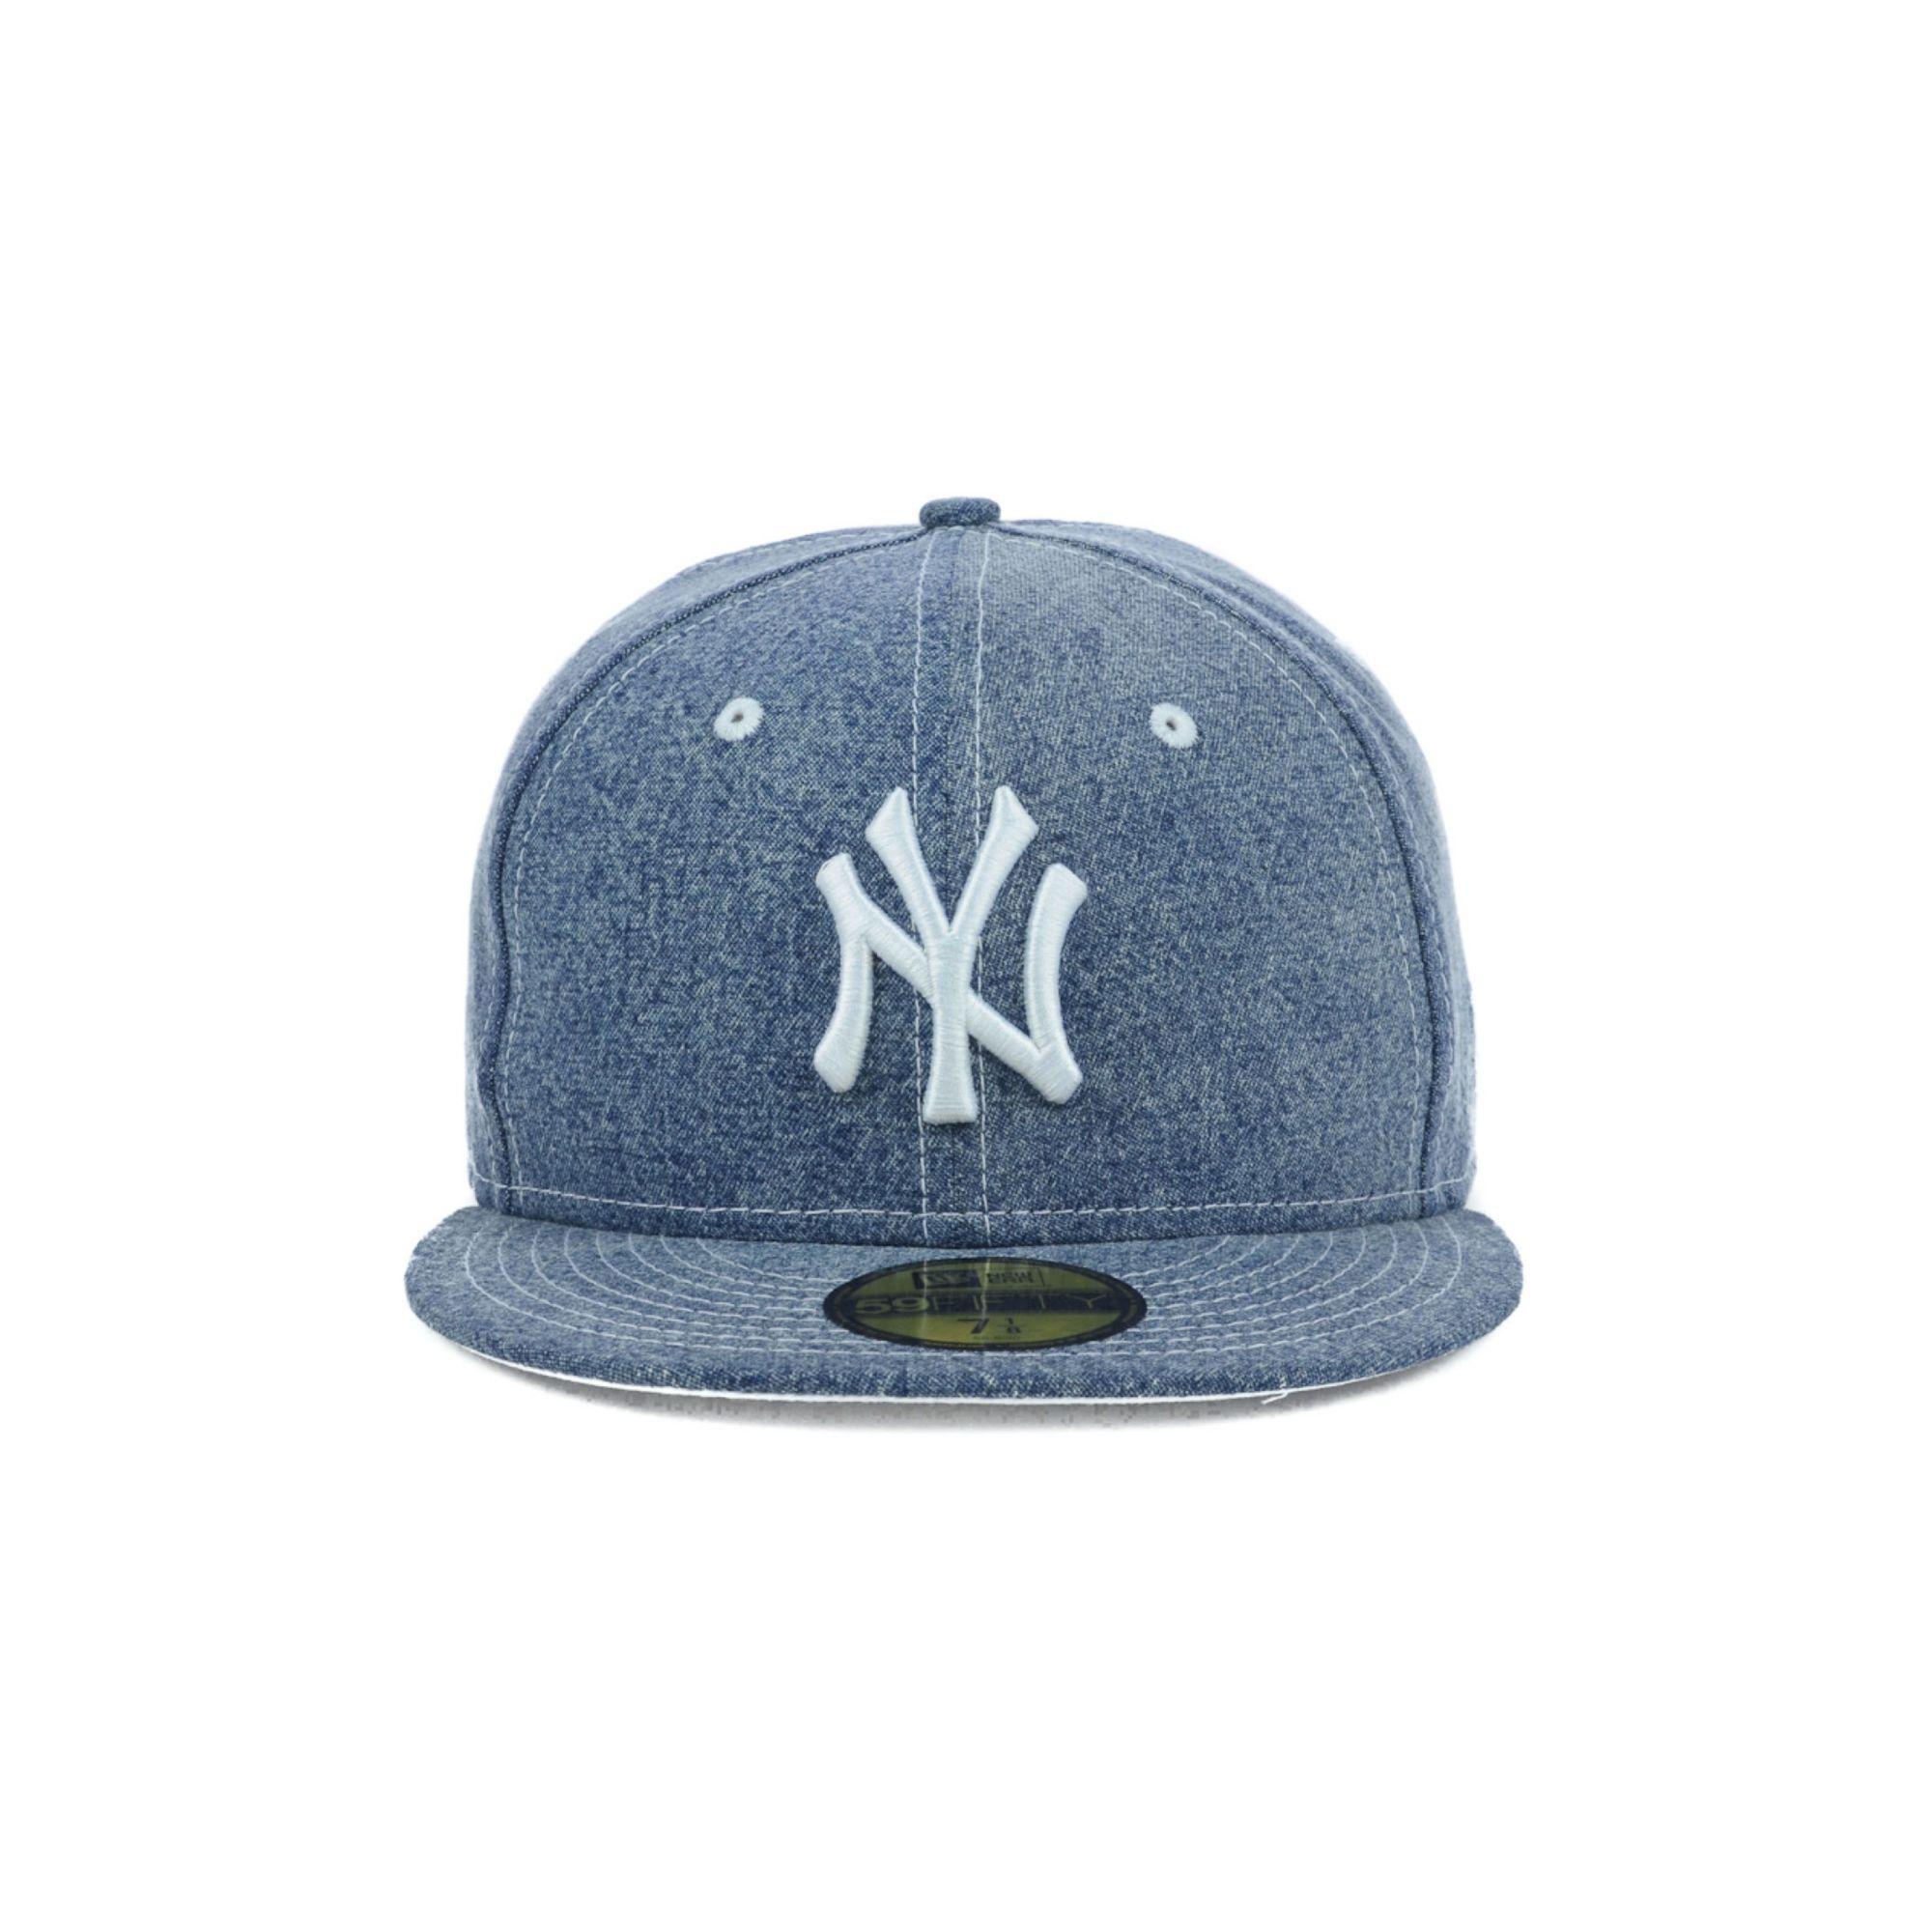 New Era New York Yankees Mlb Classic Denim 59fifty Cap In